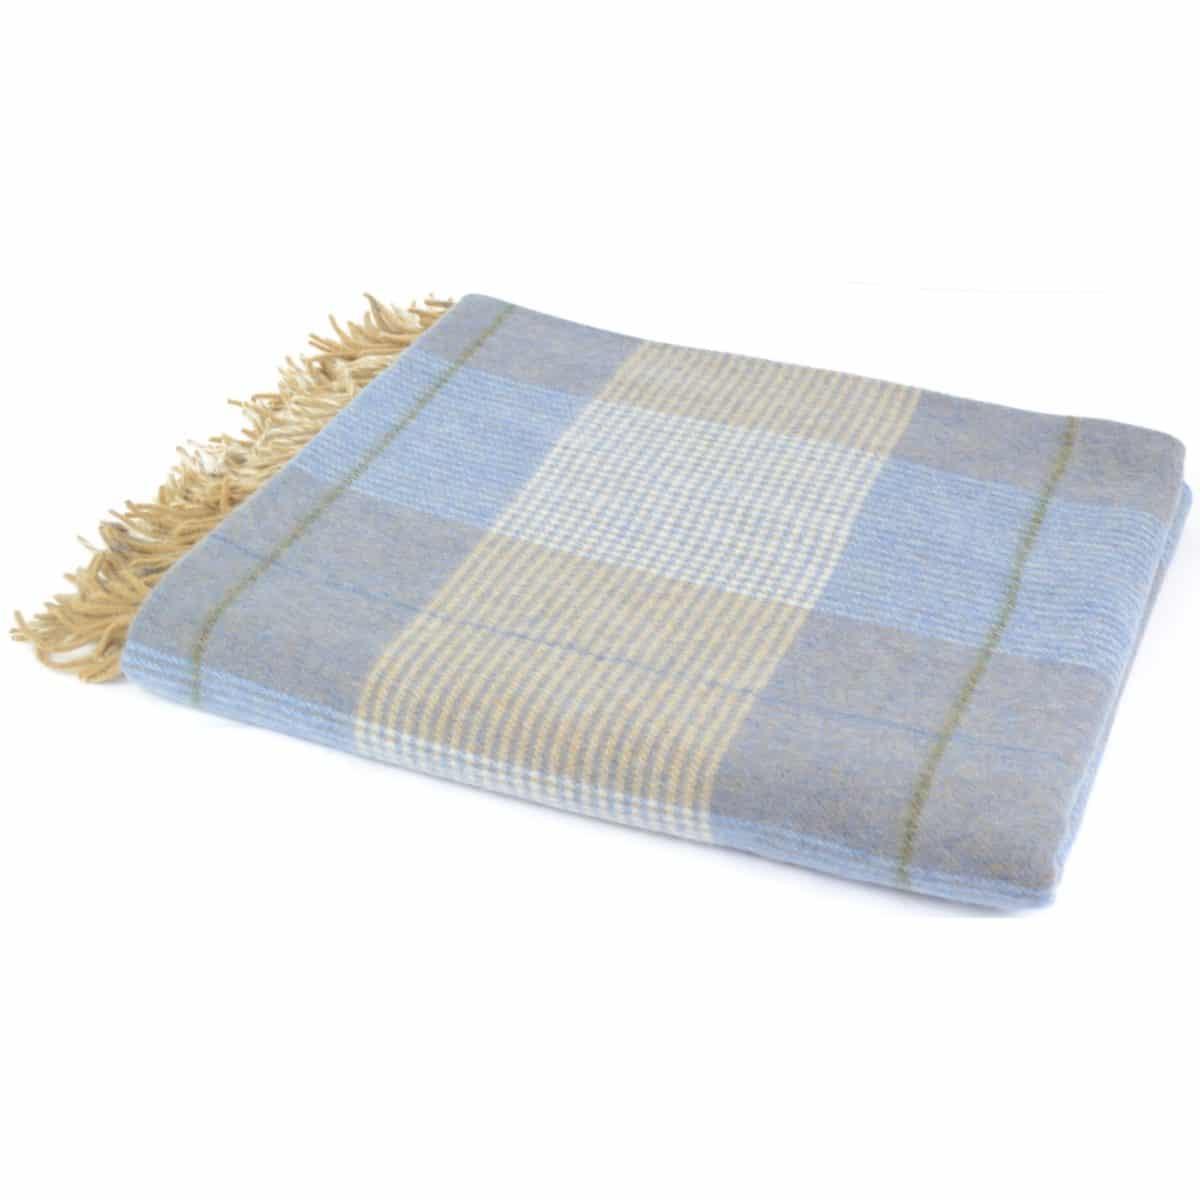 Lambswool Blanket / Throw - Baby Blue